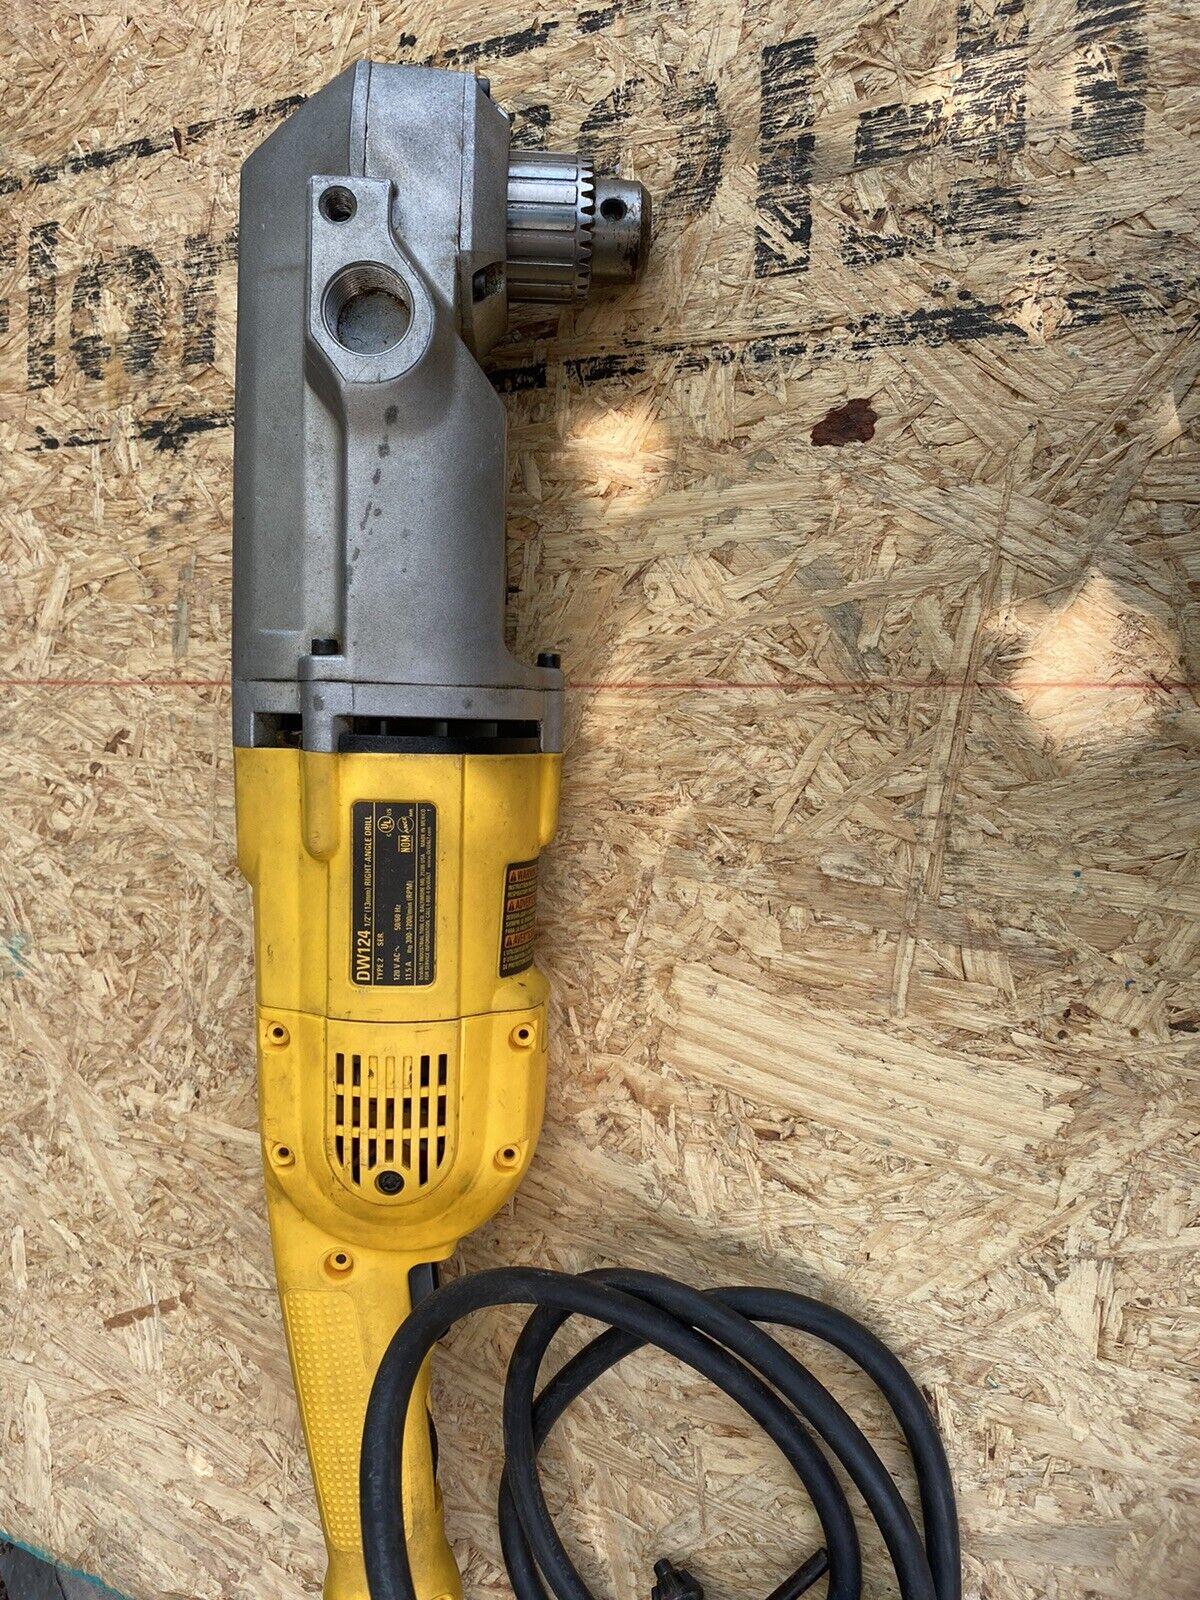 DEWALT DWD450 1//2 inch VSR Stud /& Joist Drill with Clutch for sale online